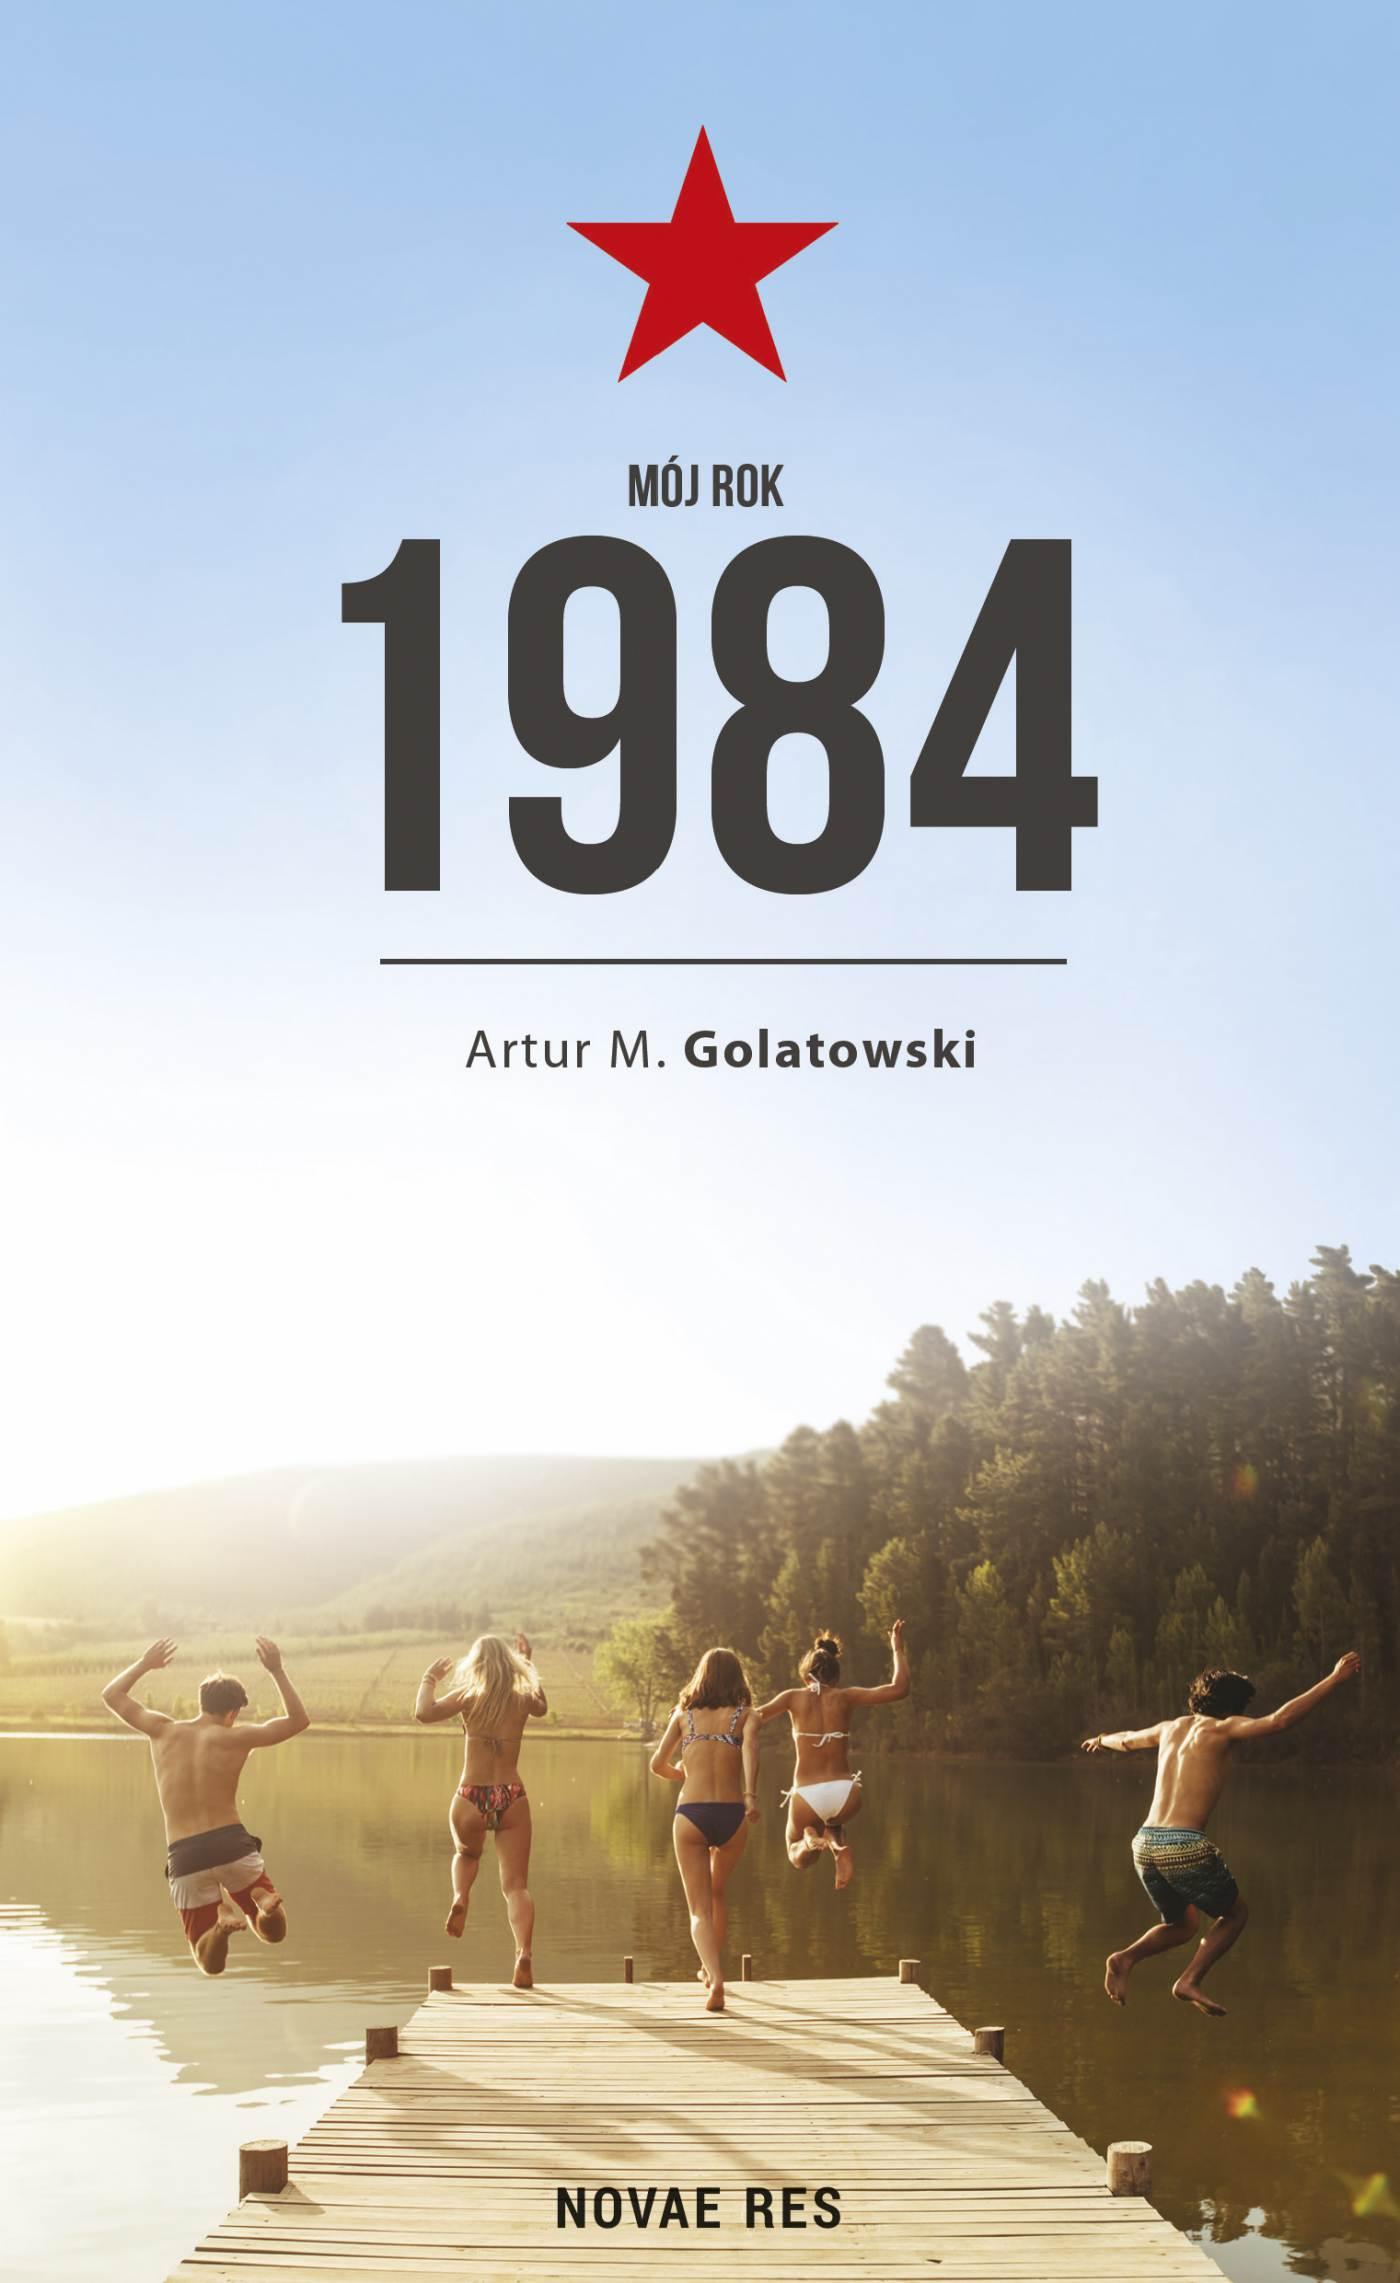 Mój rok 1984 - Ebook (Książka EPUB) do pobrania w formacie EPUB